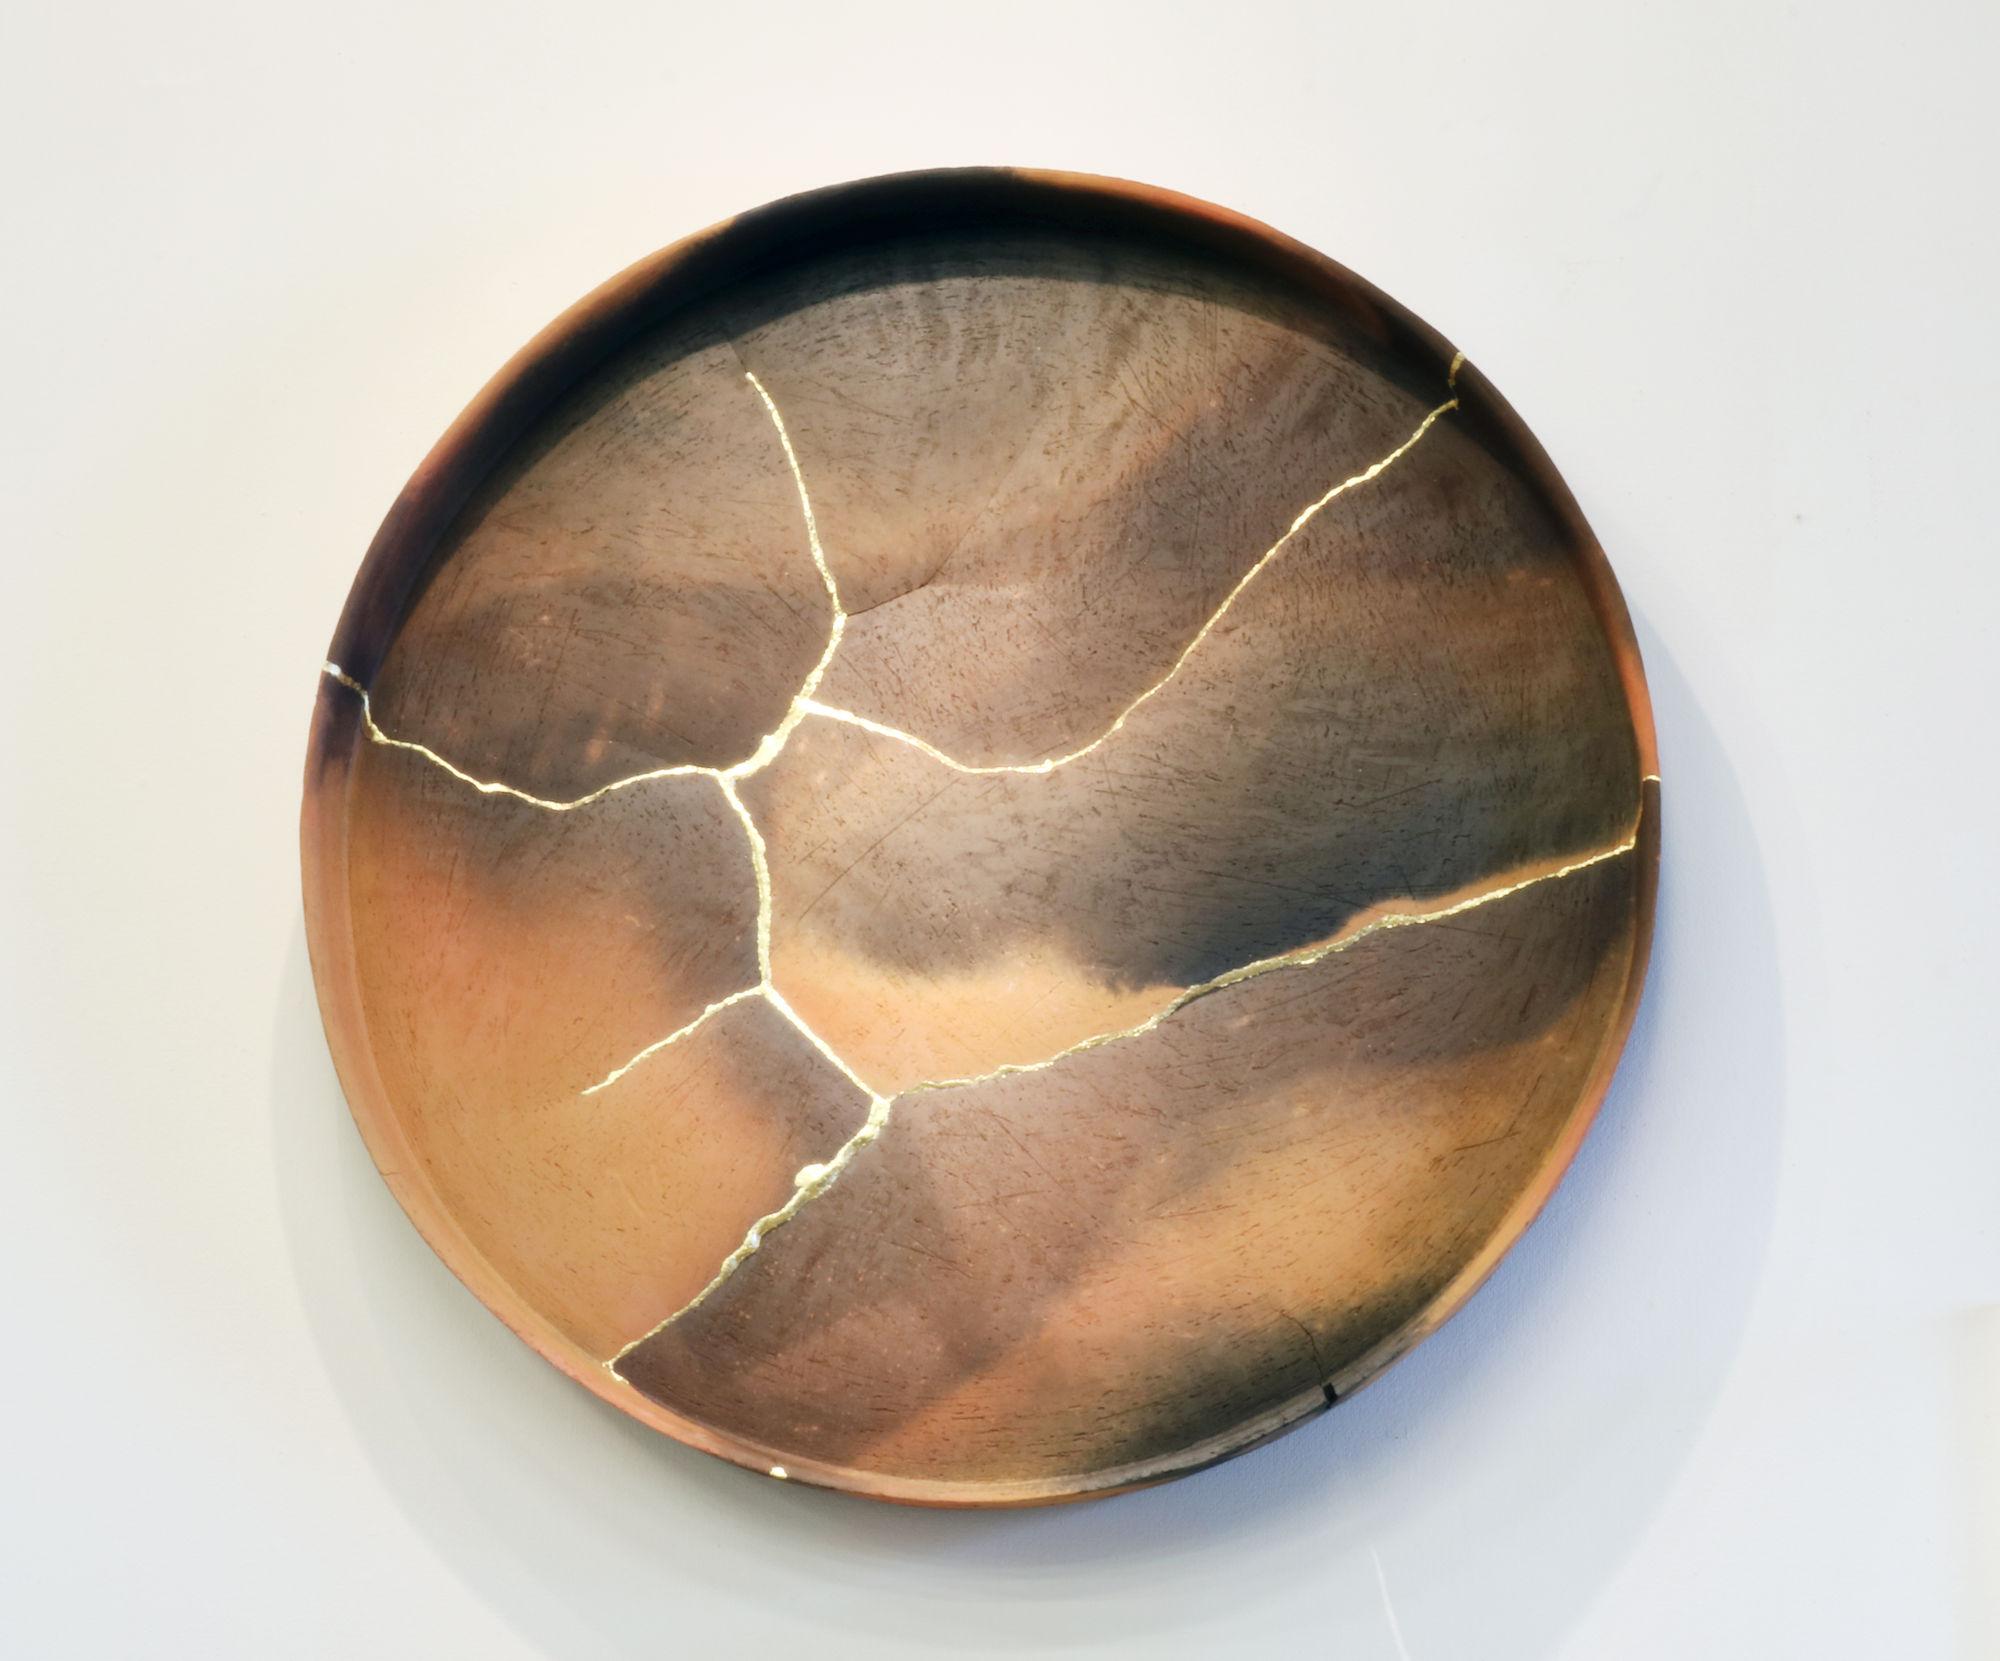 Art Metal-like Masterpieces by Tomonari Hashimoto - Red Circle ceramic Ceramic Art Metal-like Masterpieces by Tomonari Hashimoto e5ce76197b9a4f6fab15bd387d018c28